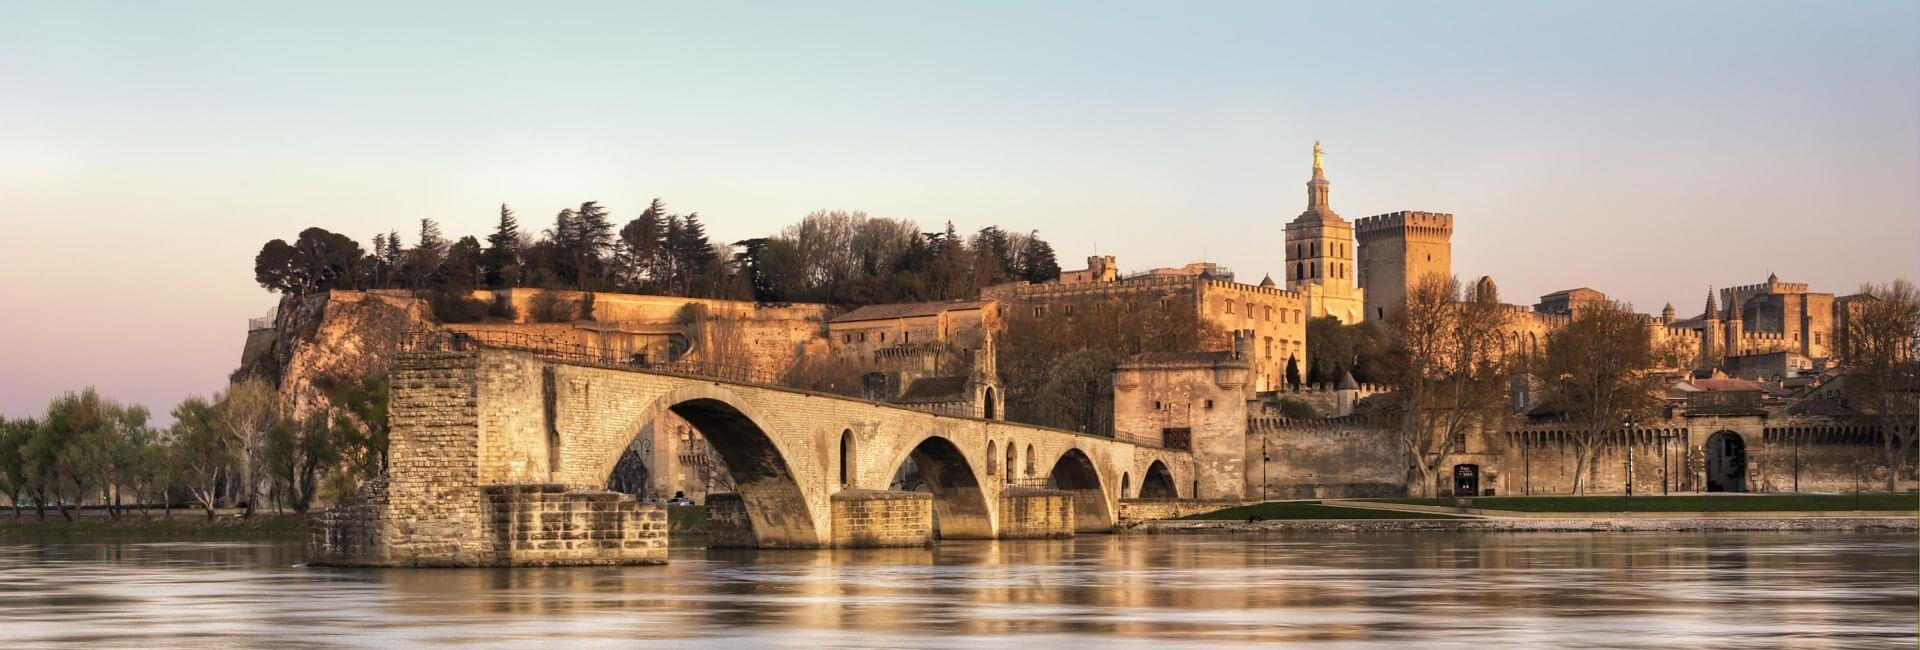 treasures of burgundy & provence